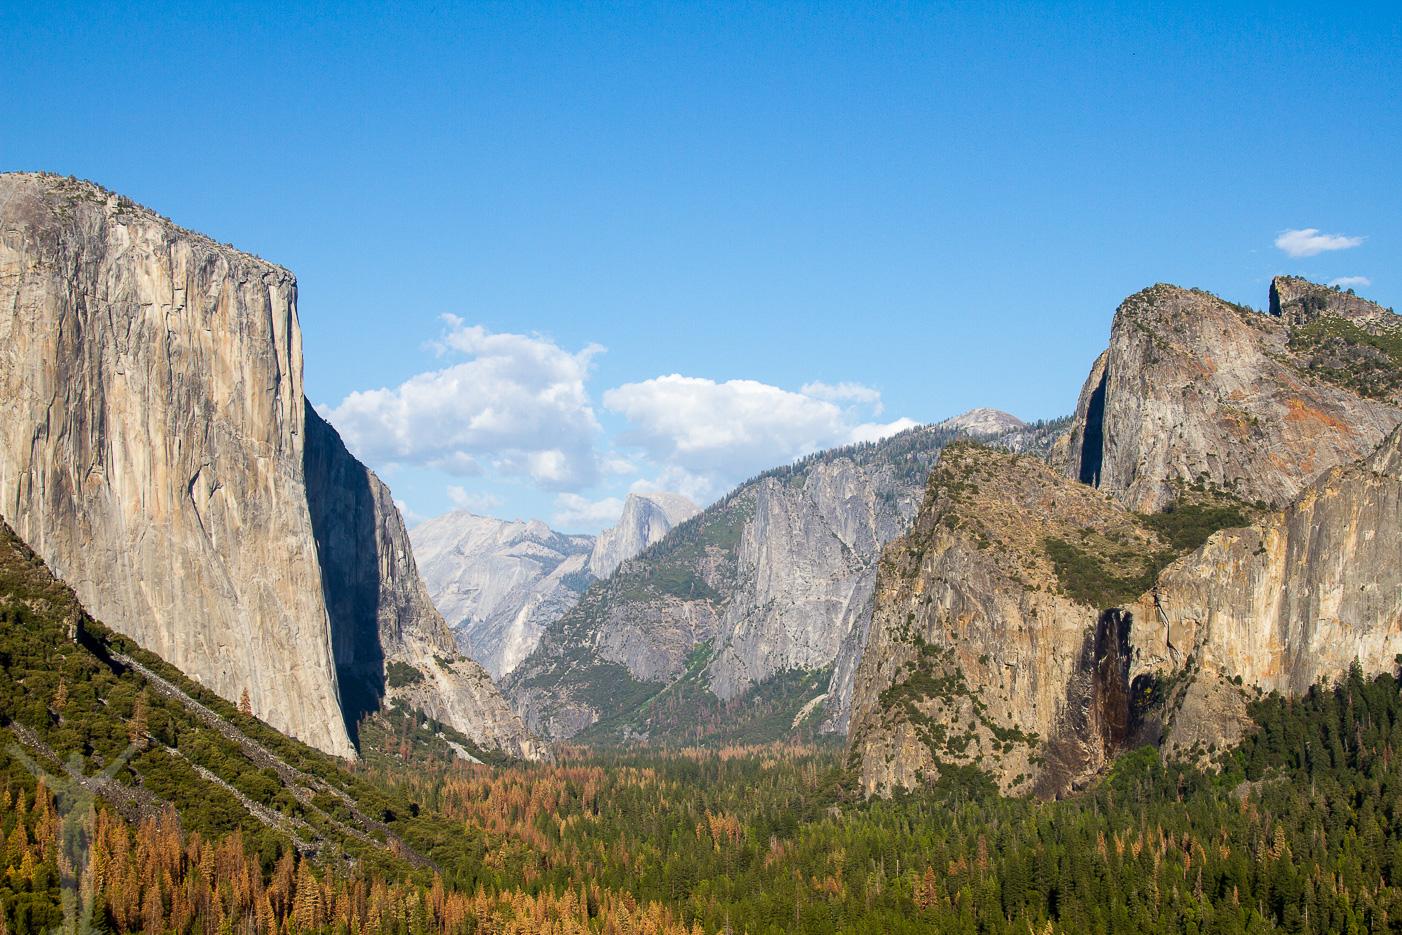 Klassisk bild av Tunnel View i Yosemite